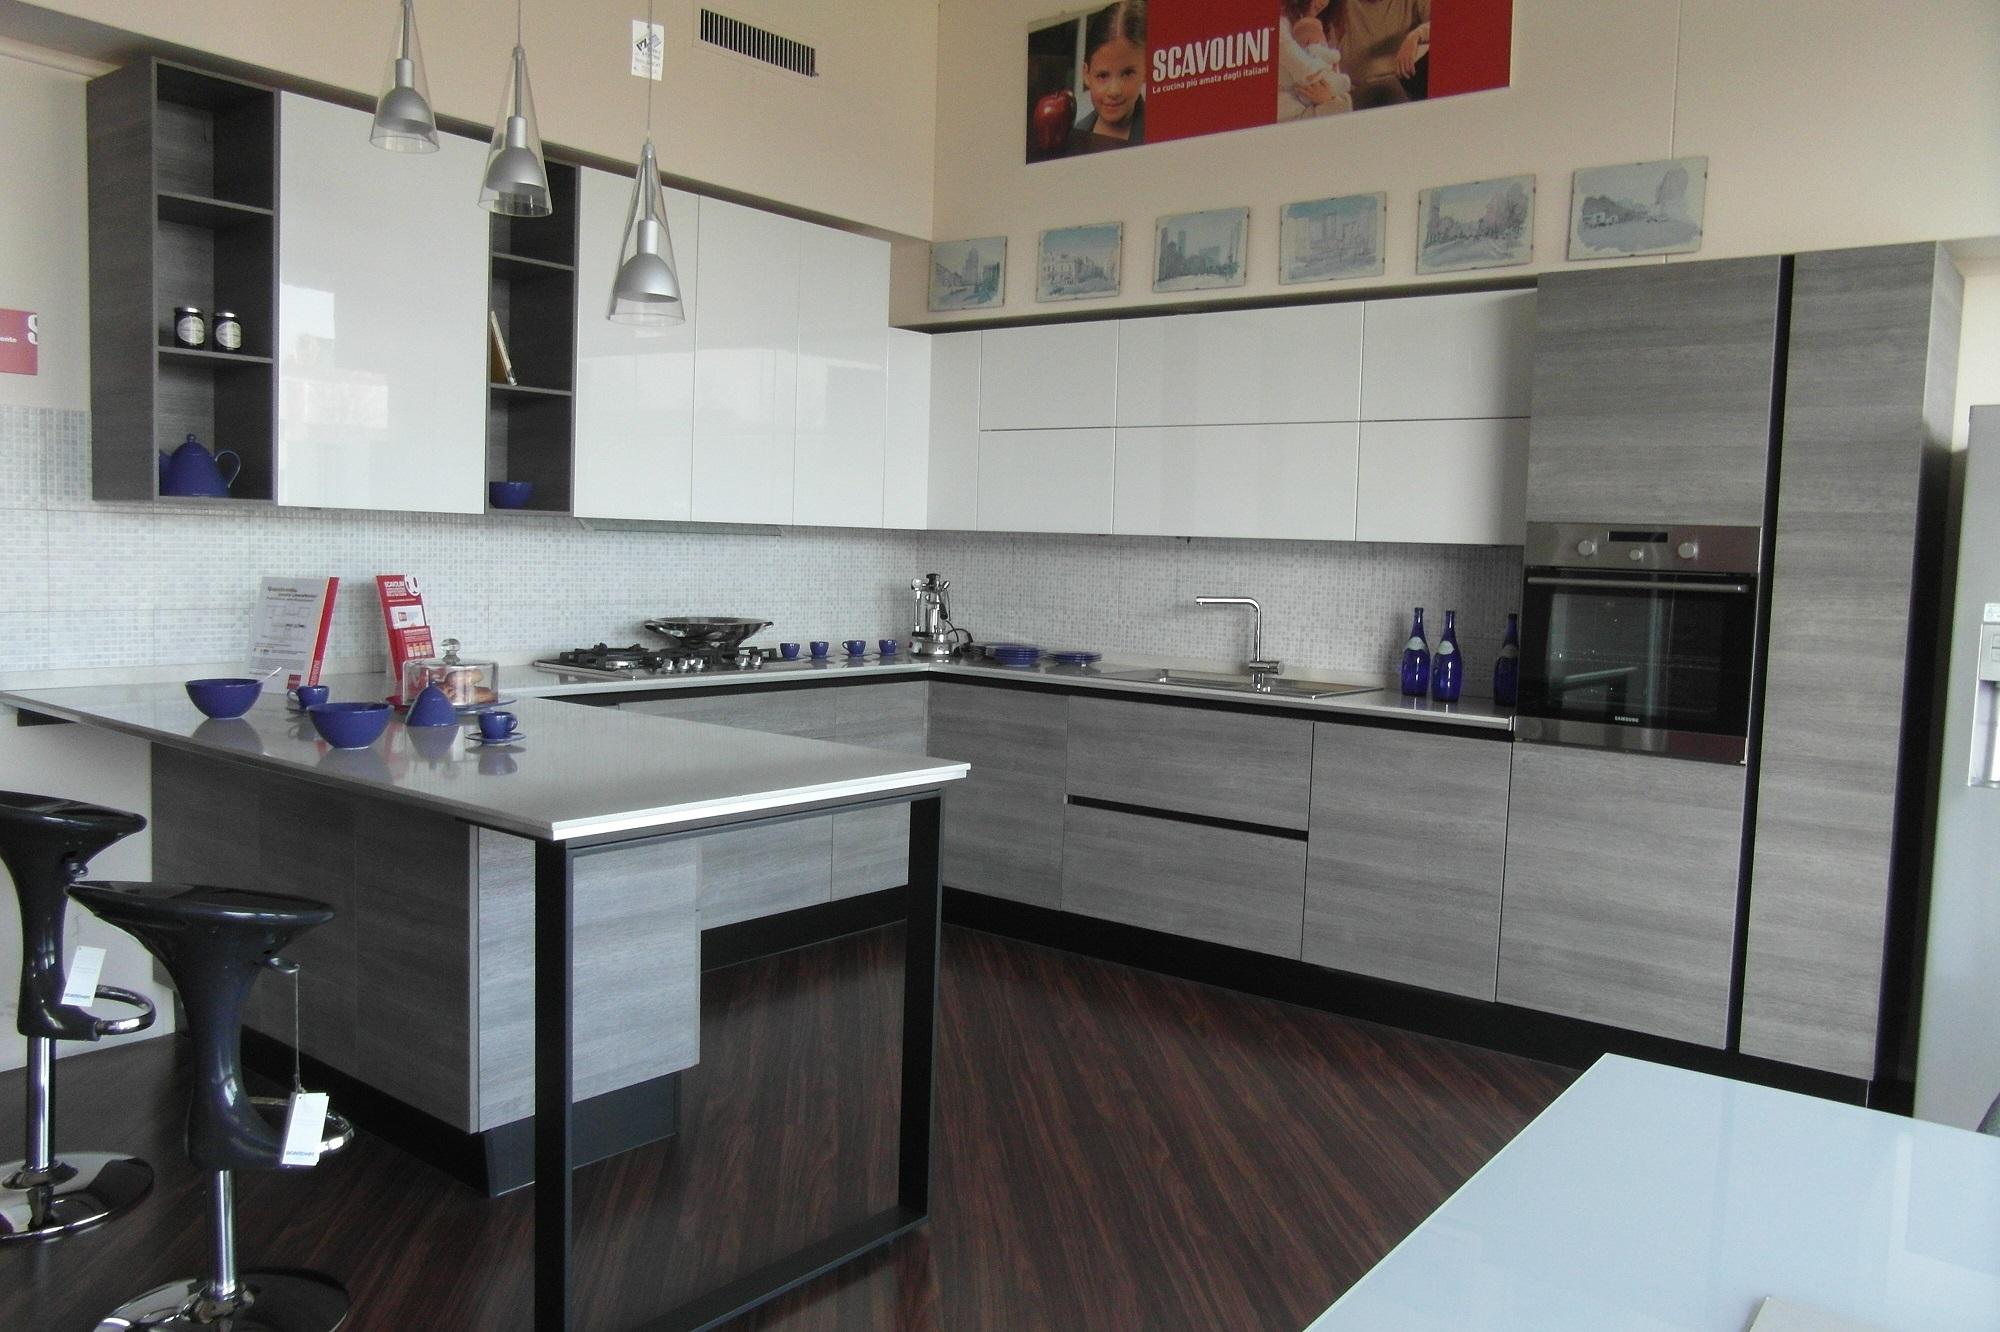 Cucina scavolini moderna alto livello sconto 31 cucine - Cucine d arredo ...